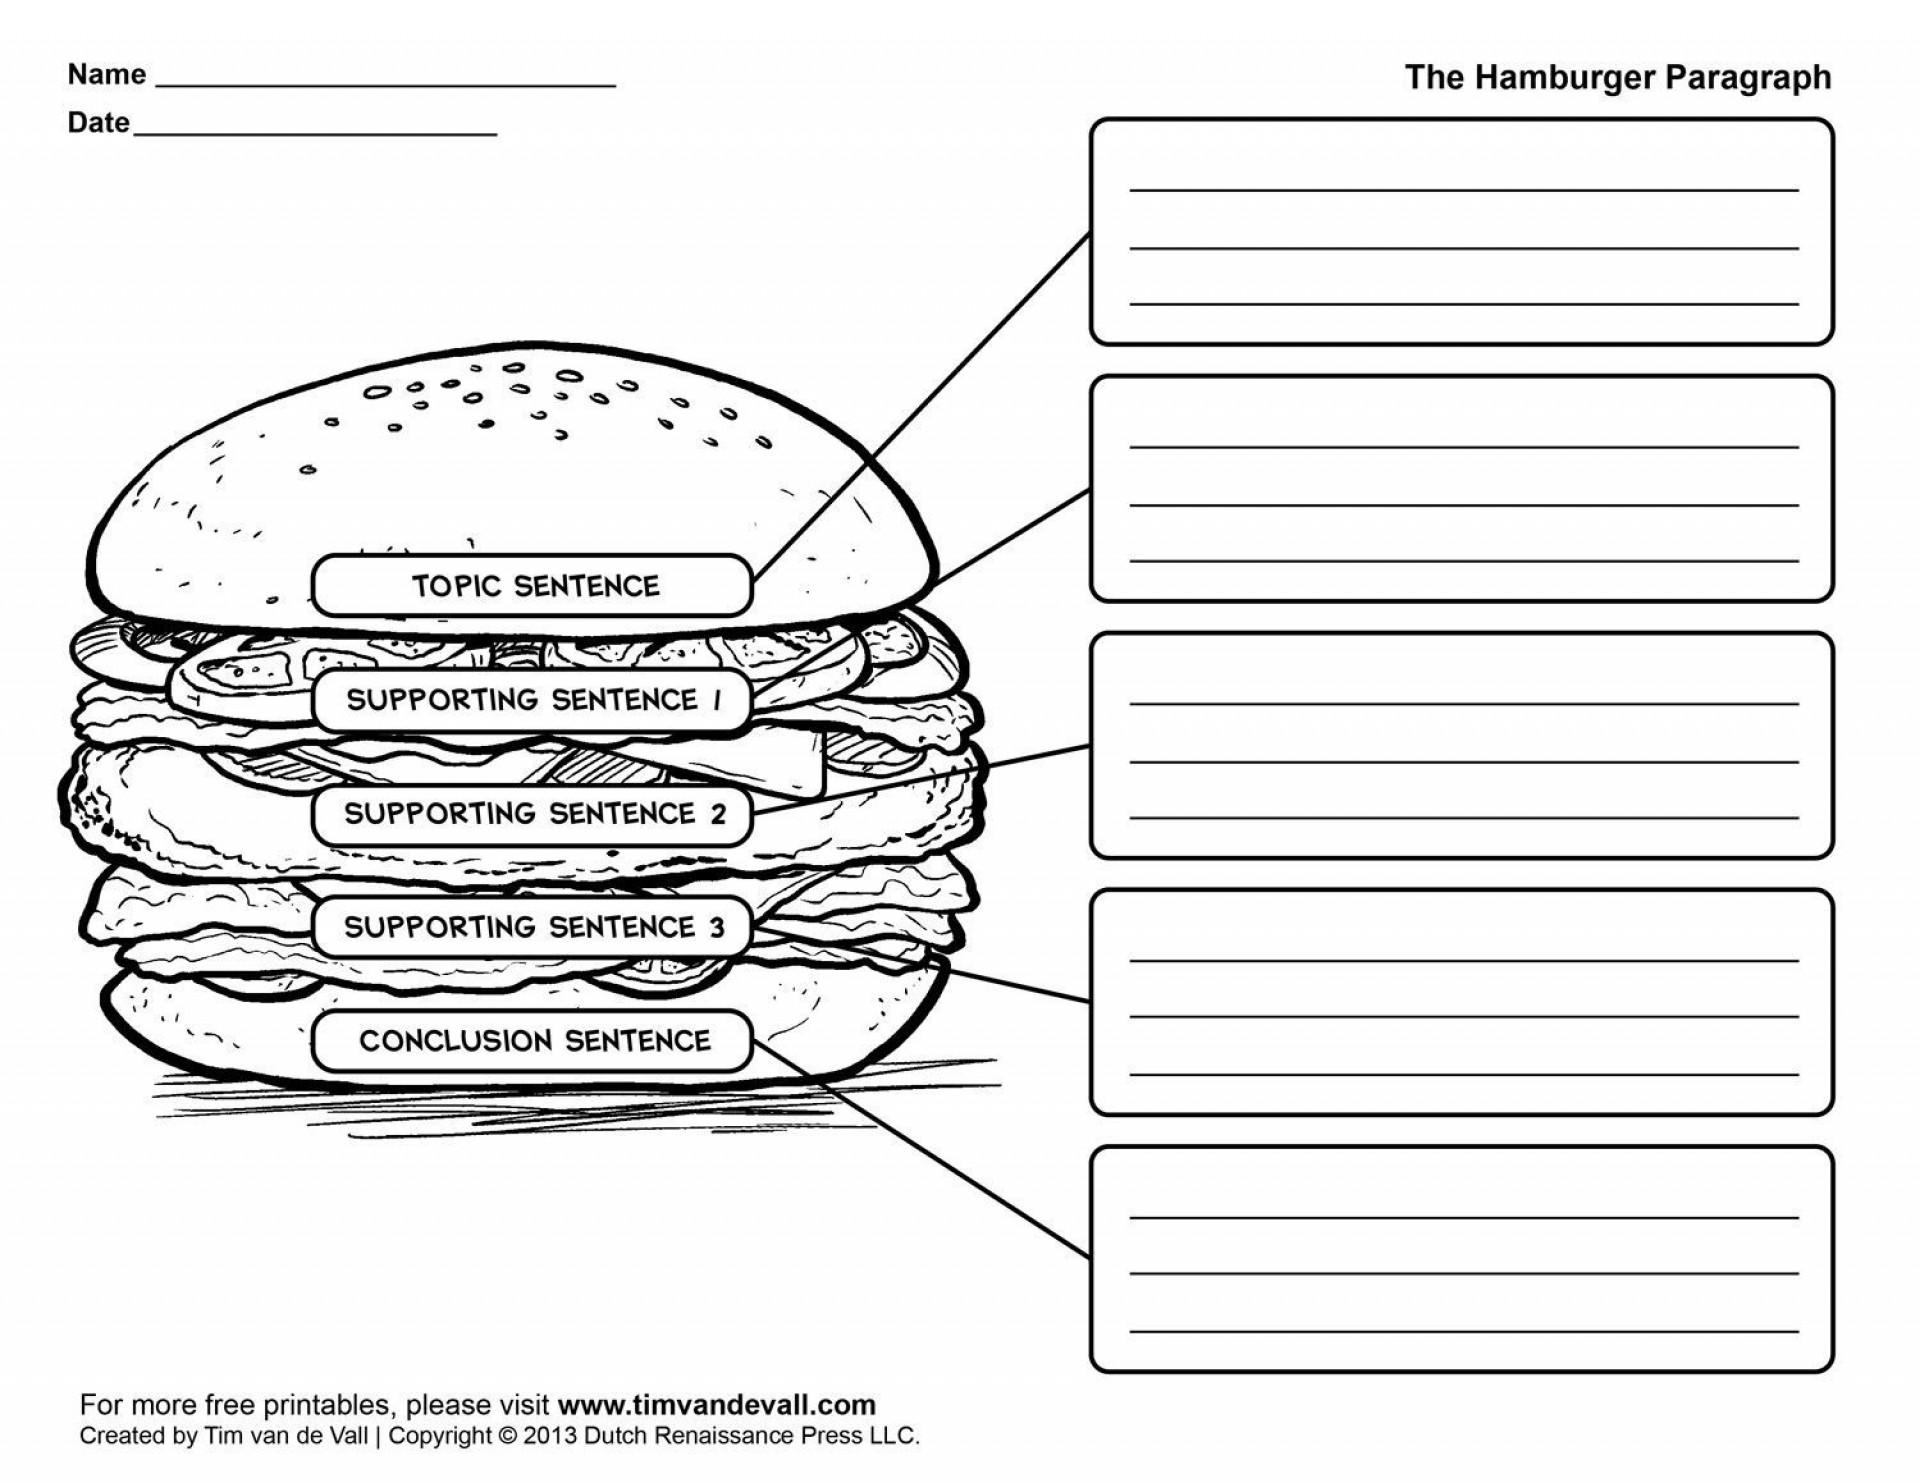 009 Essay Example Five Paragraph Graphic Wonderful Organizer High School Definition 5 Pdf 1920